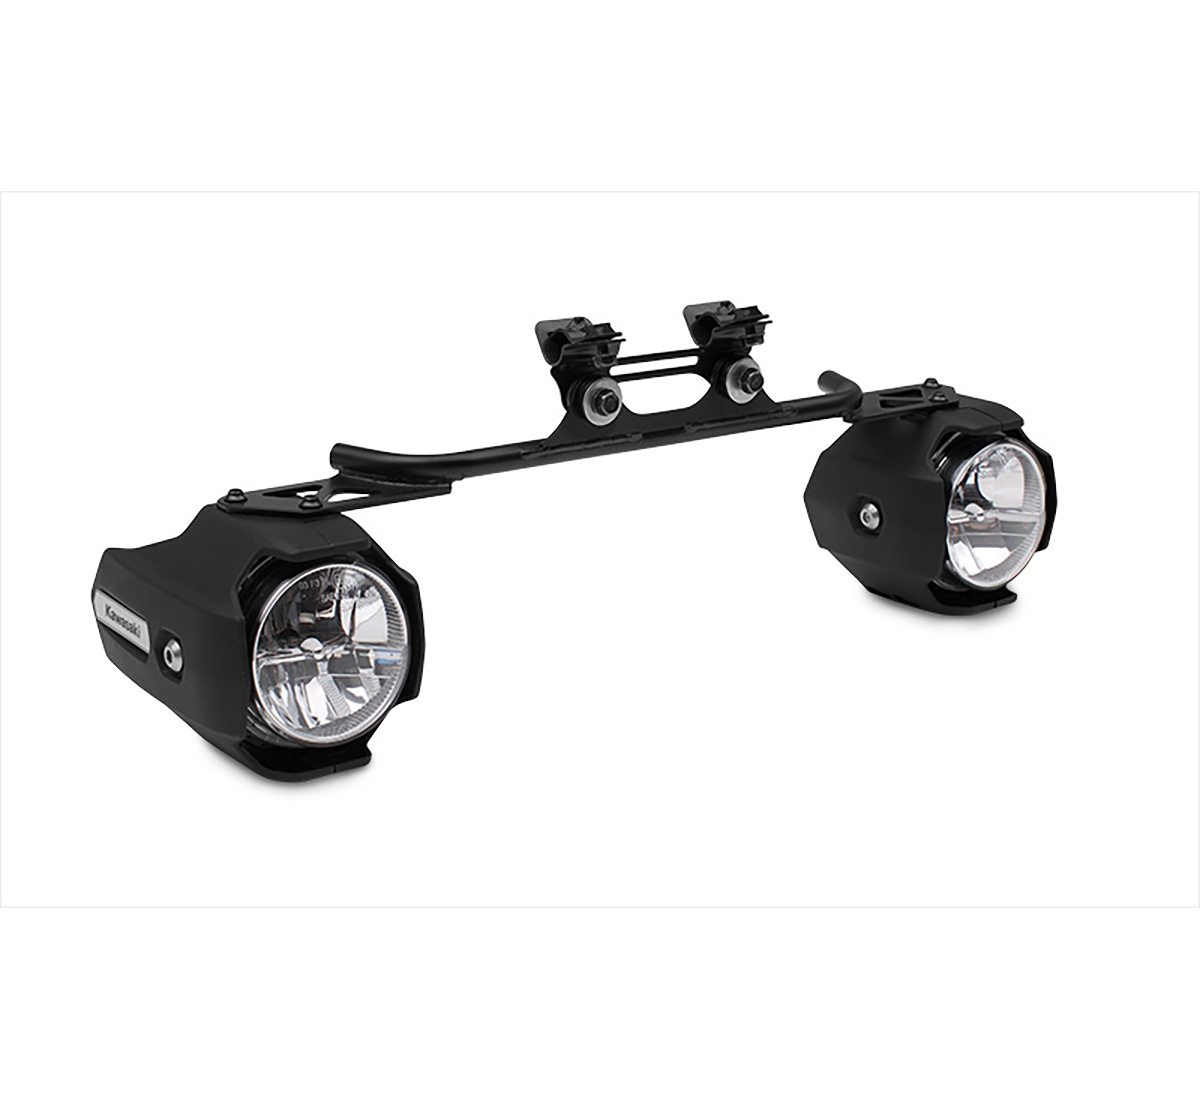 2015 VERSYS® 1000 LT LED Light Bar